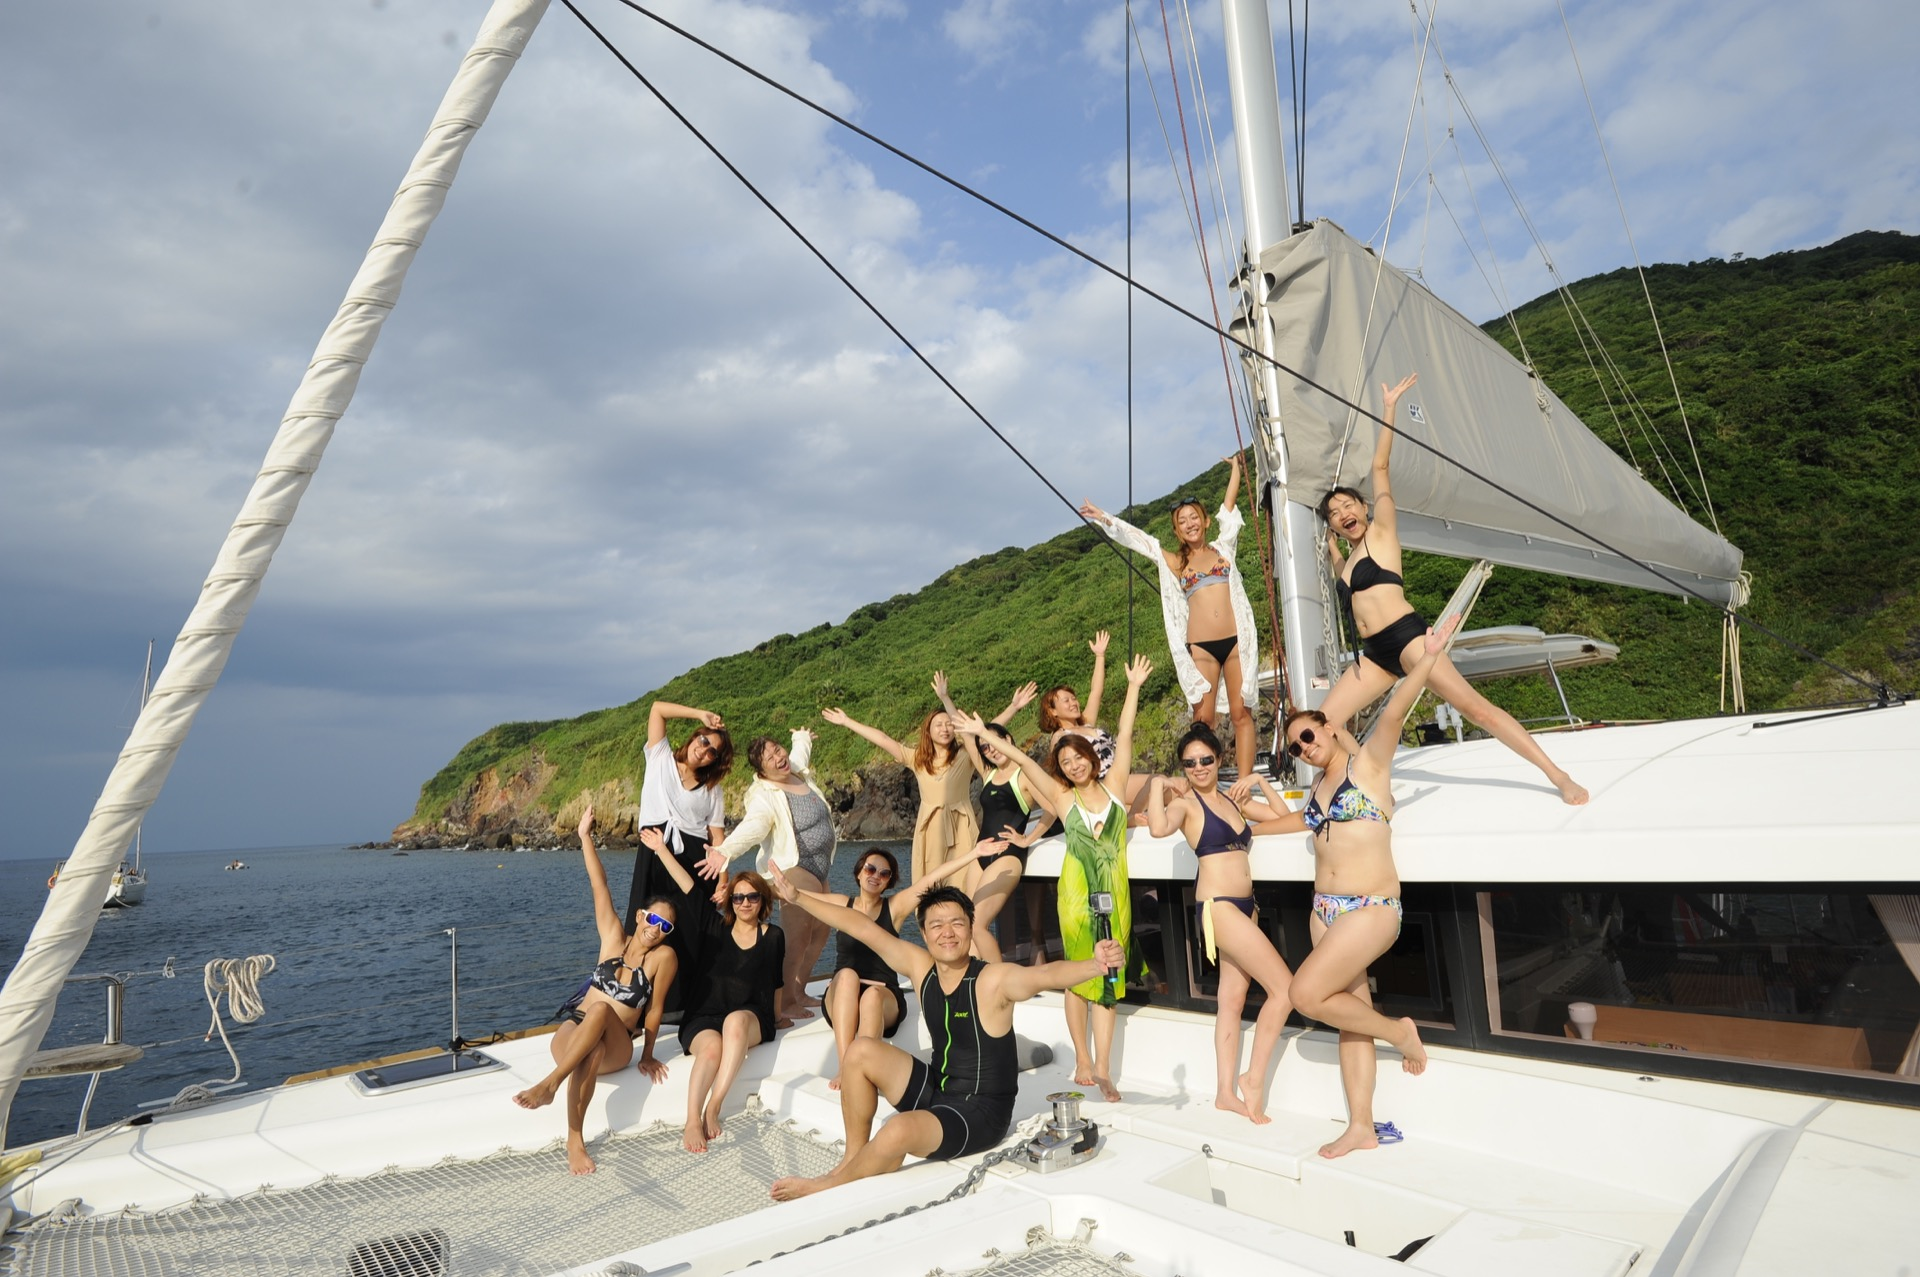 德築-DEZU-project-Fun3sport-lagoon-sailboat-ocean-4